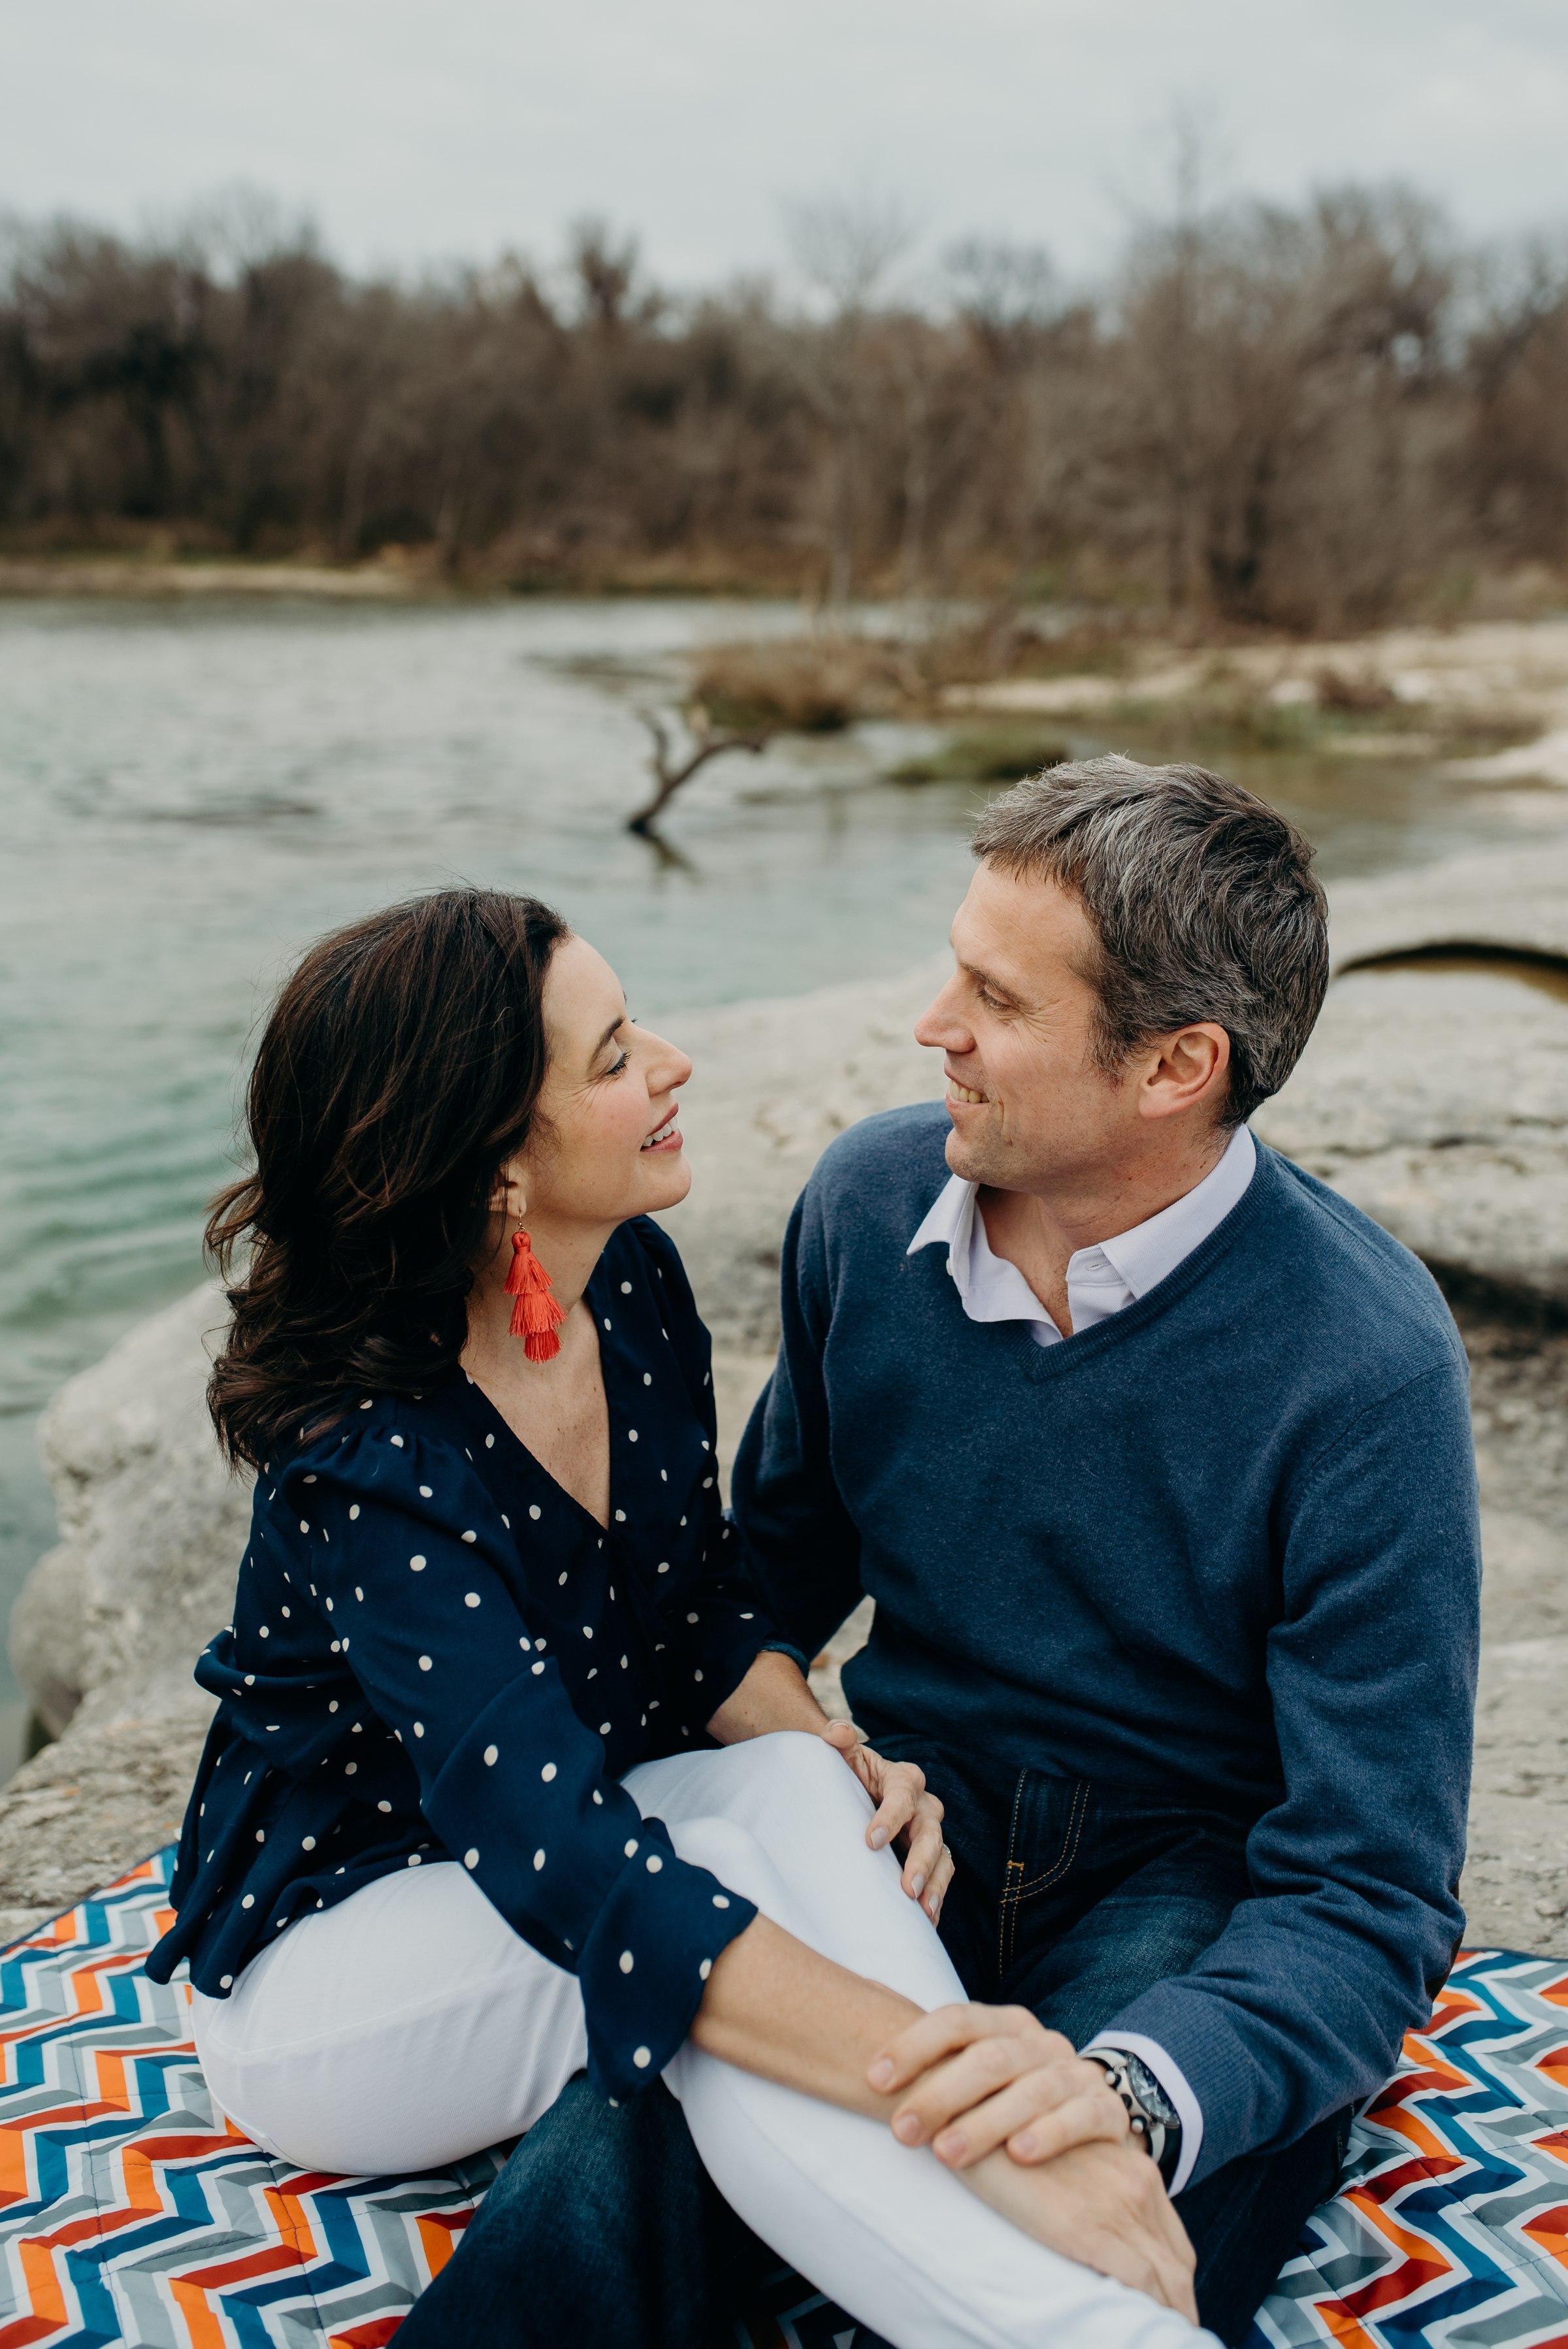 austin-mckinney-falls-engagement-photographer-elopement-prices-best-headshot-senior-adventurous-italy-minneapolis-texas-minnesota-dallas-houston-tulum-mexico_0023.jpg